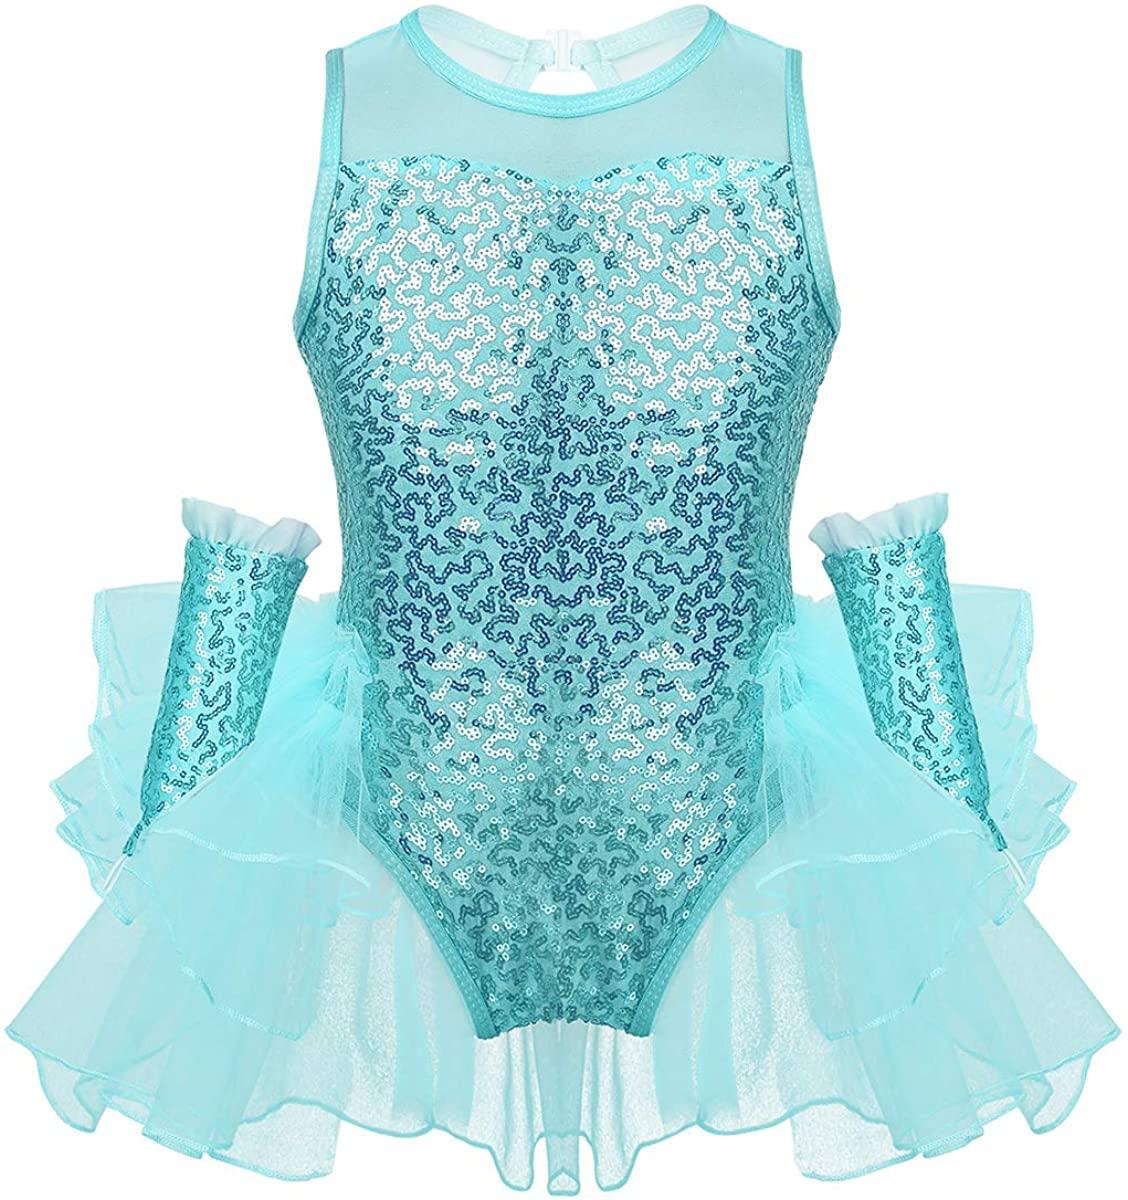 ACSUSS Kids Girls Shiny Sequins Ballet Tutu Dress Dancewear Tank Top Leotard Stage Performance Ballerina Dance Costume